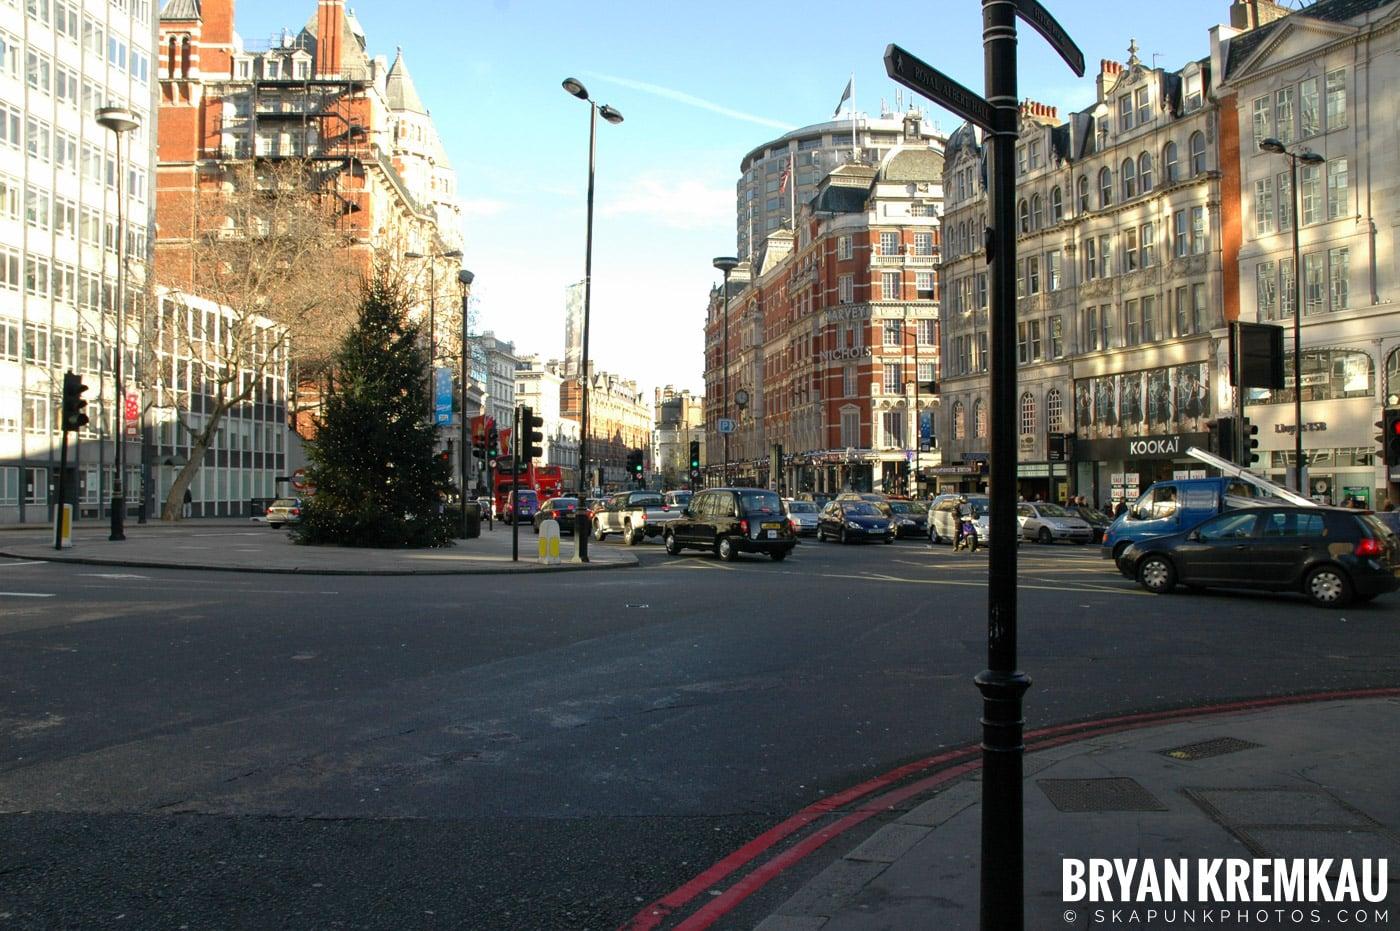 London, England - Day 3 - 12.18.05 (37)